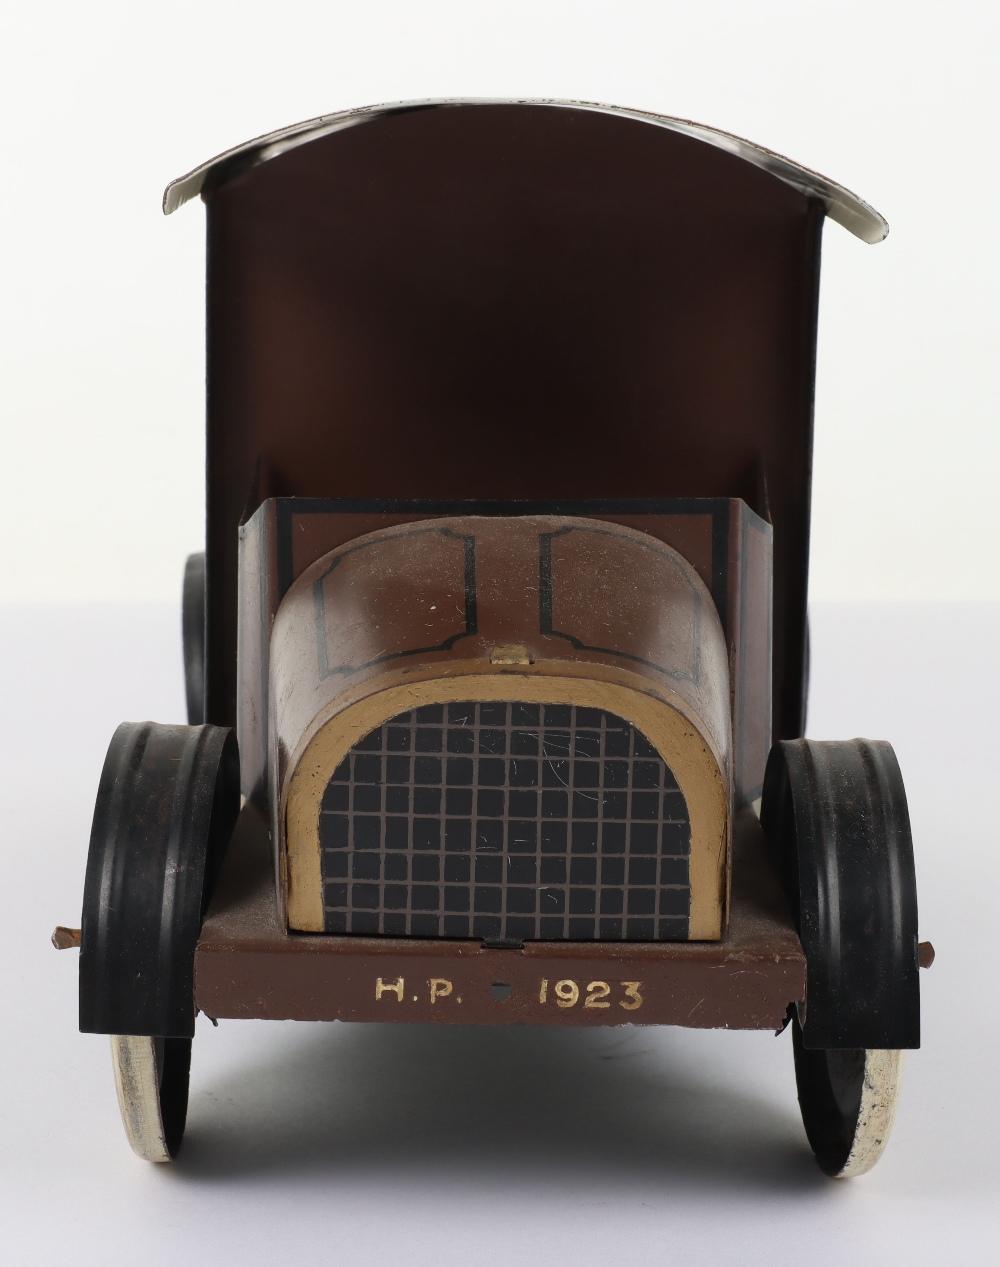 Huntley & Palmers Ltd Reading Biscuits Tinplate Delivery Van - Image 3 of 7